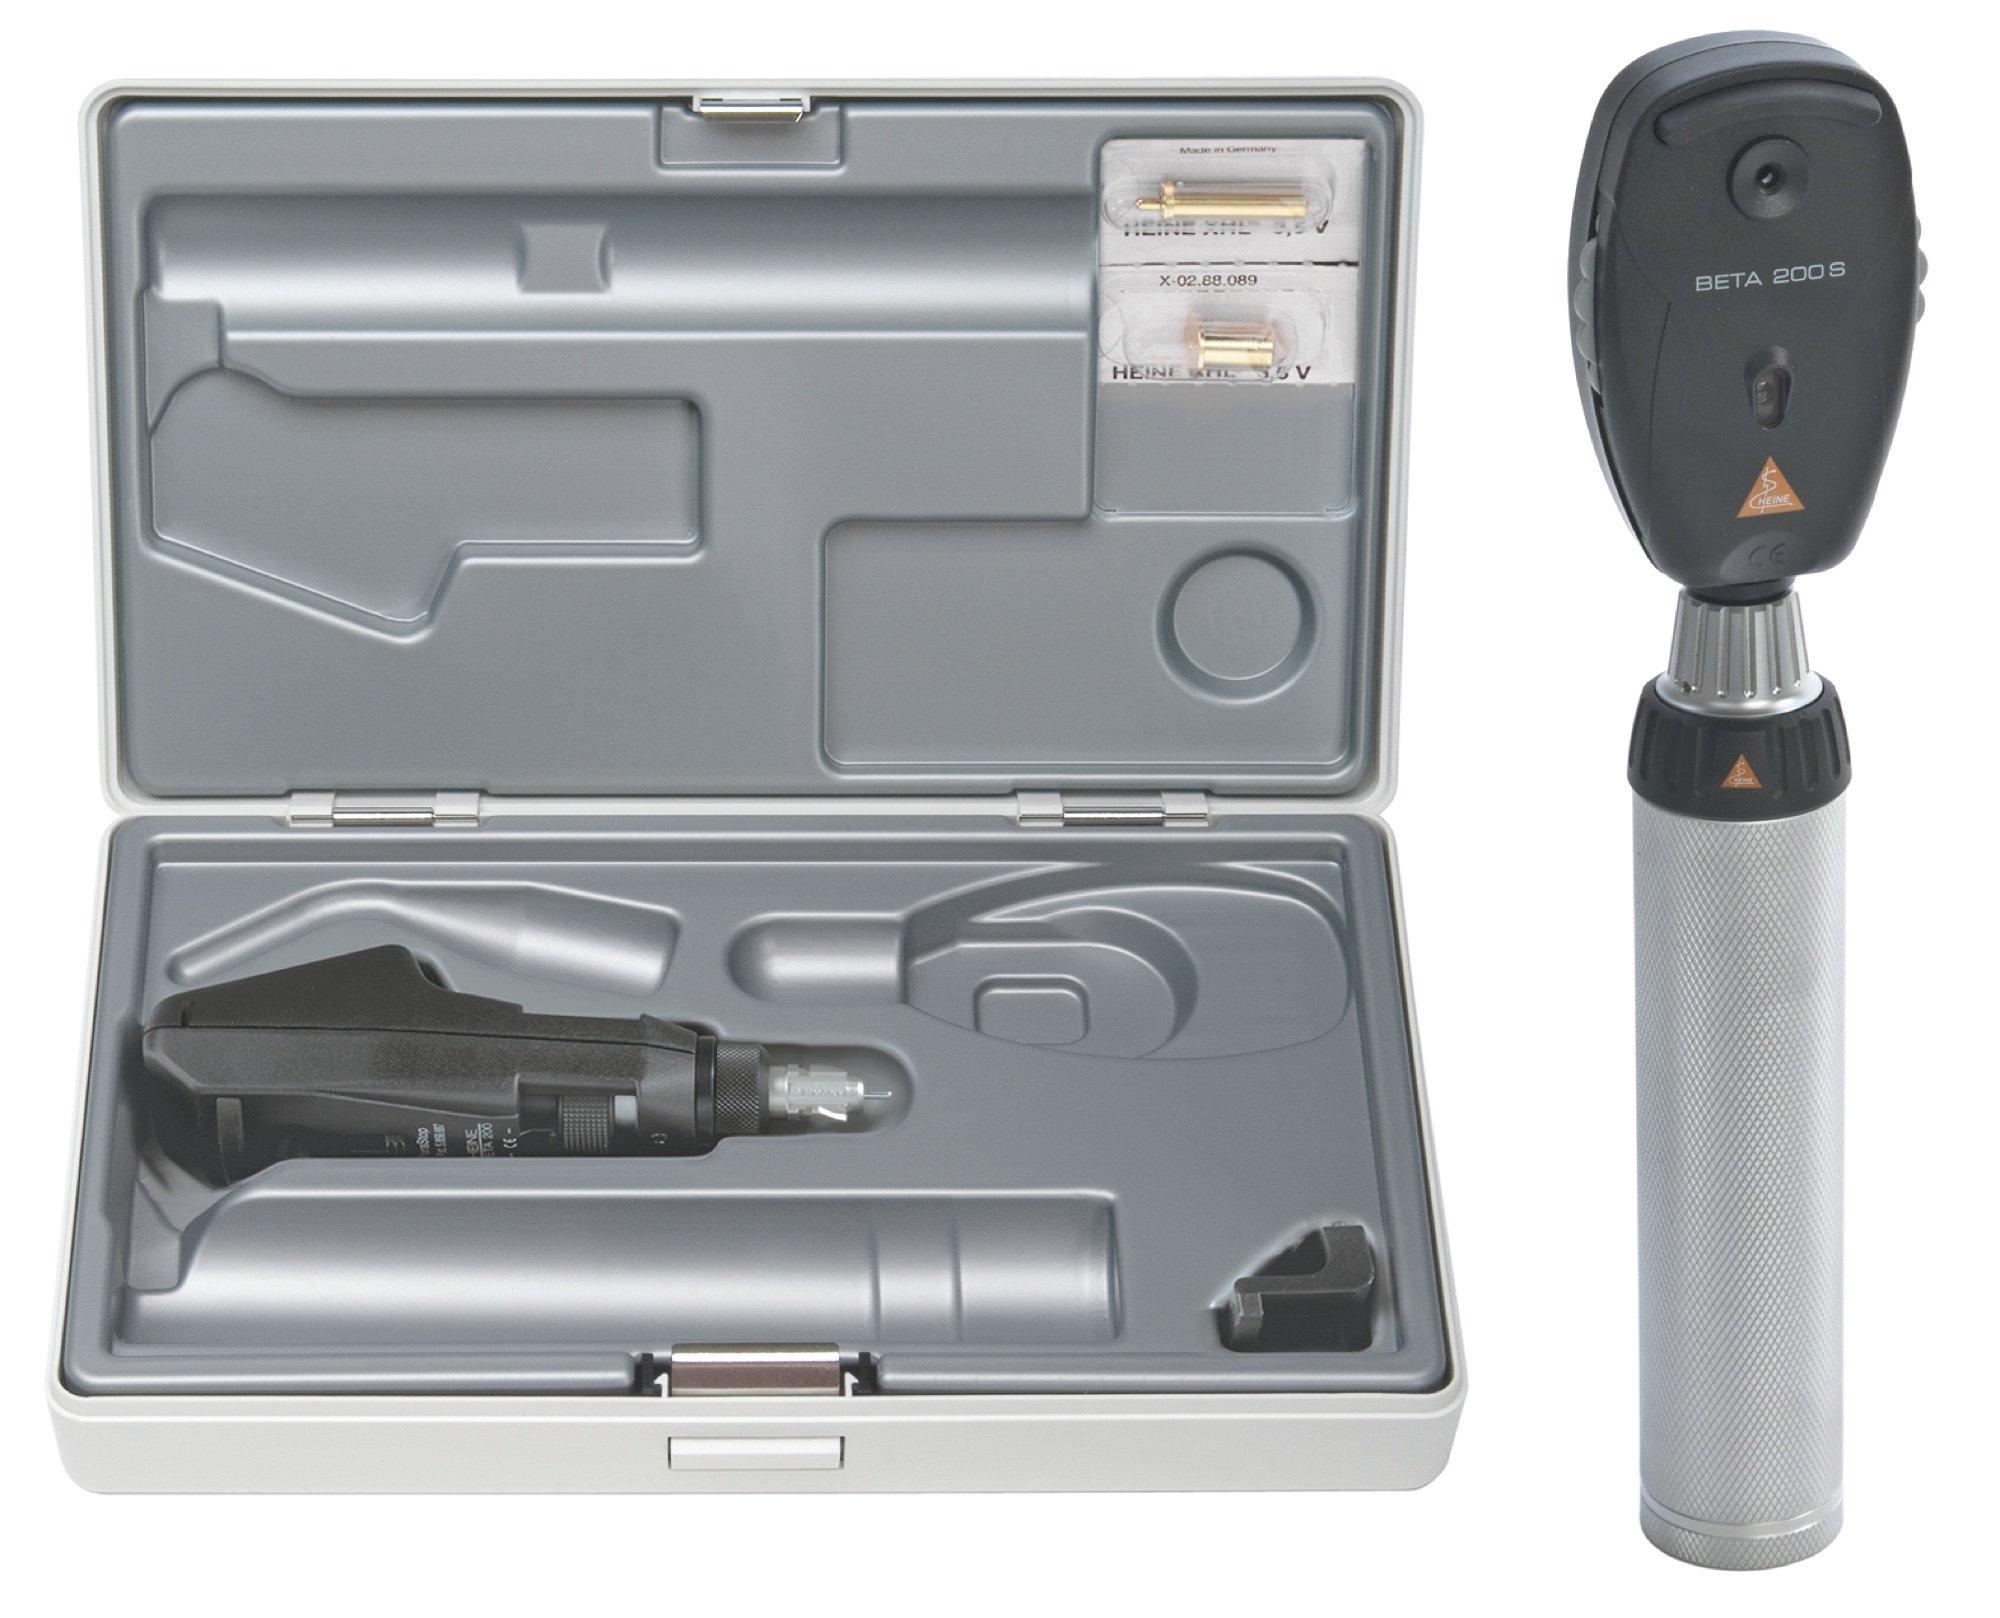 HEINE BETA200 S Opthalmoscope/BETA 200 Streak Retinoscope Diagnostic Set with Battery Handle